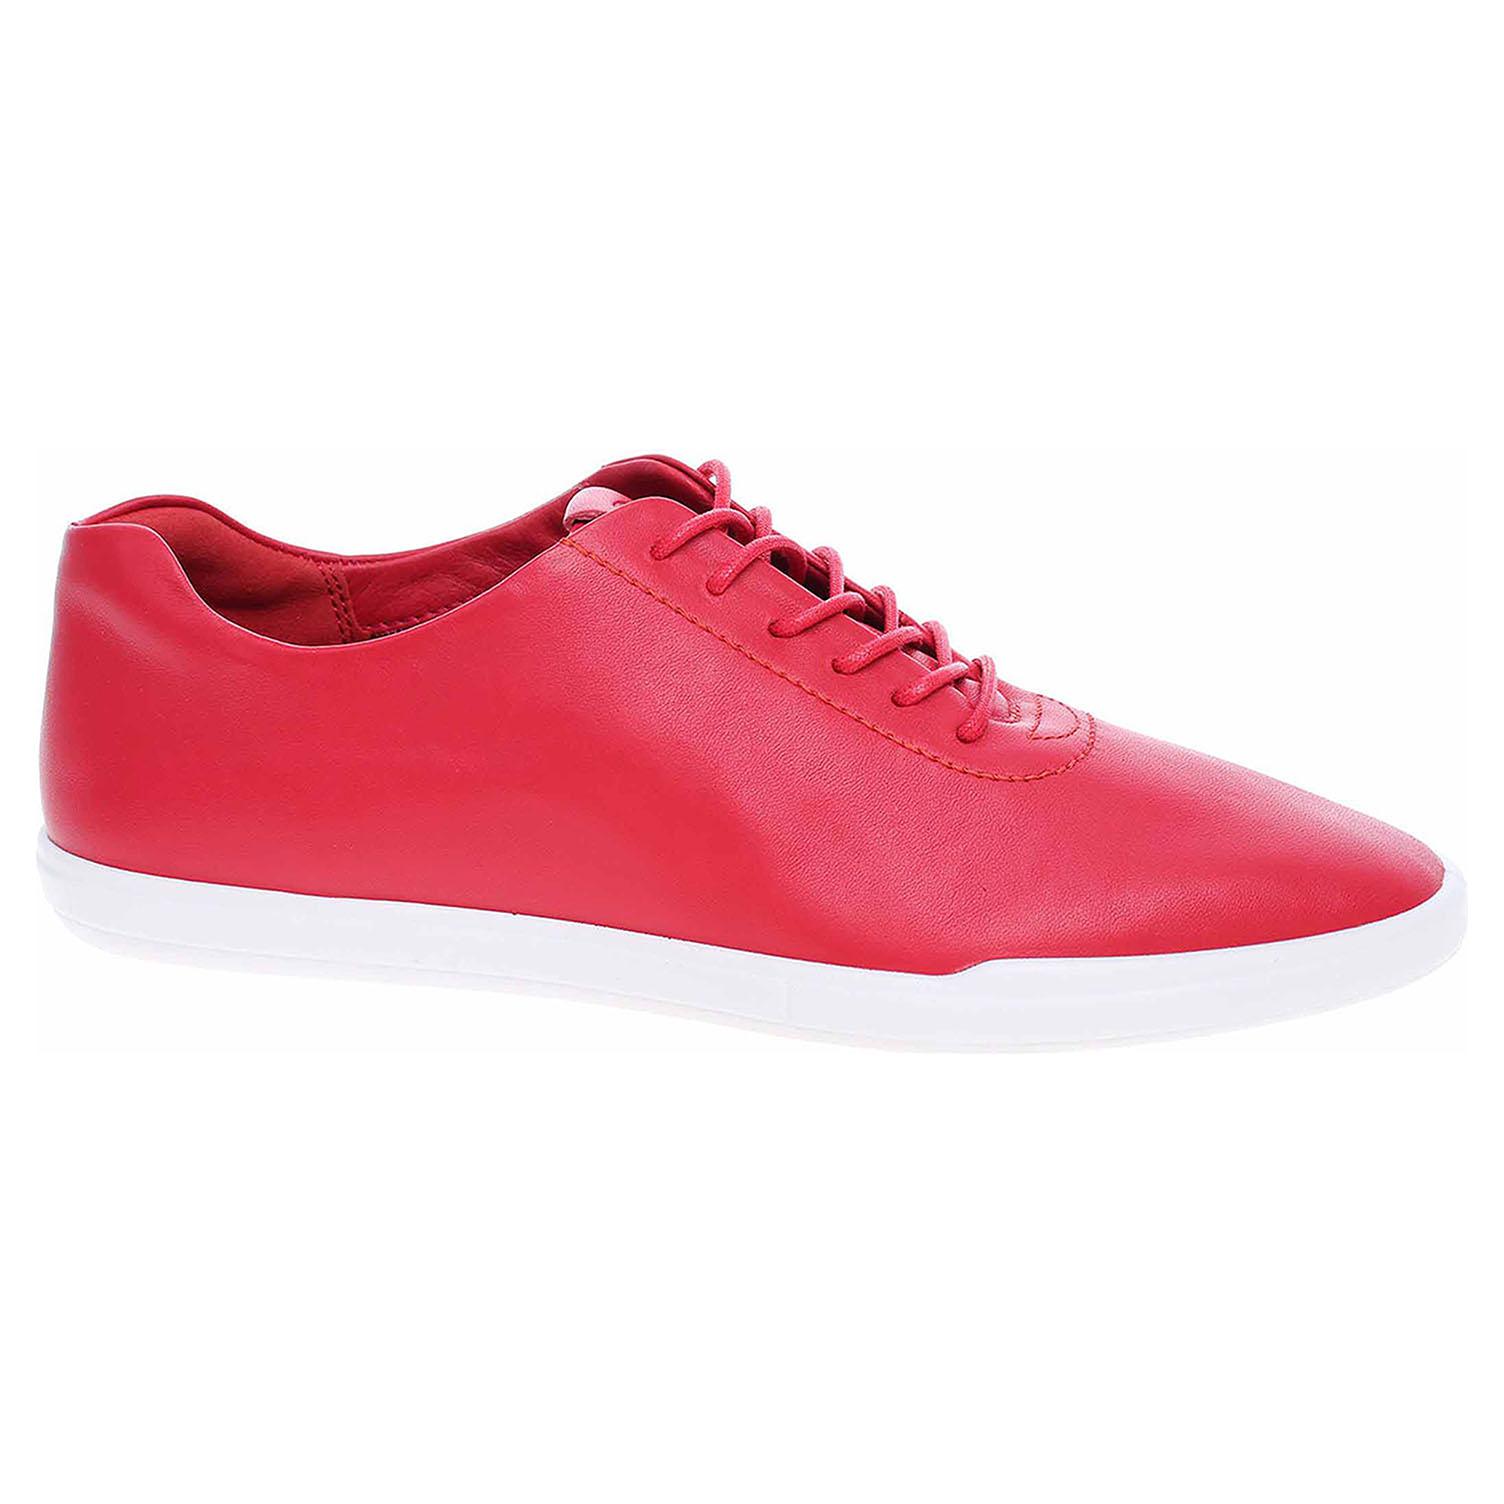 Dámská obuv Ecco Simpil W 20861301466 chili red 20861301466 39